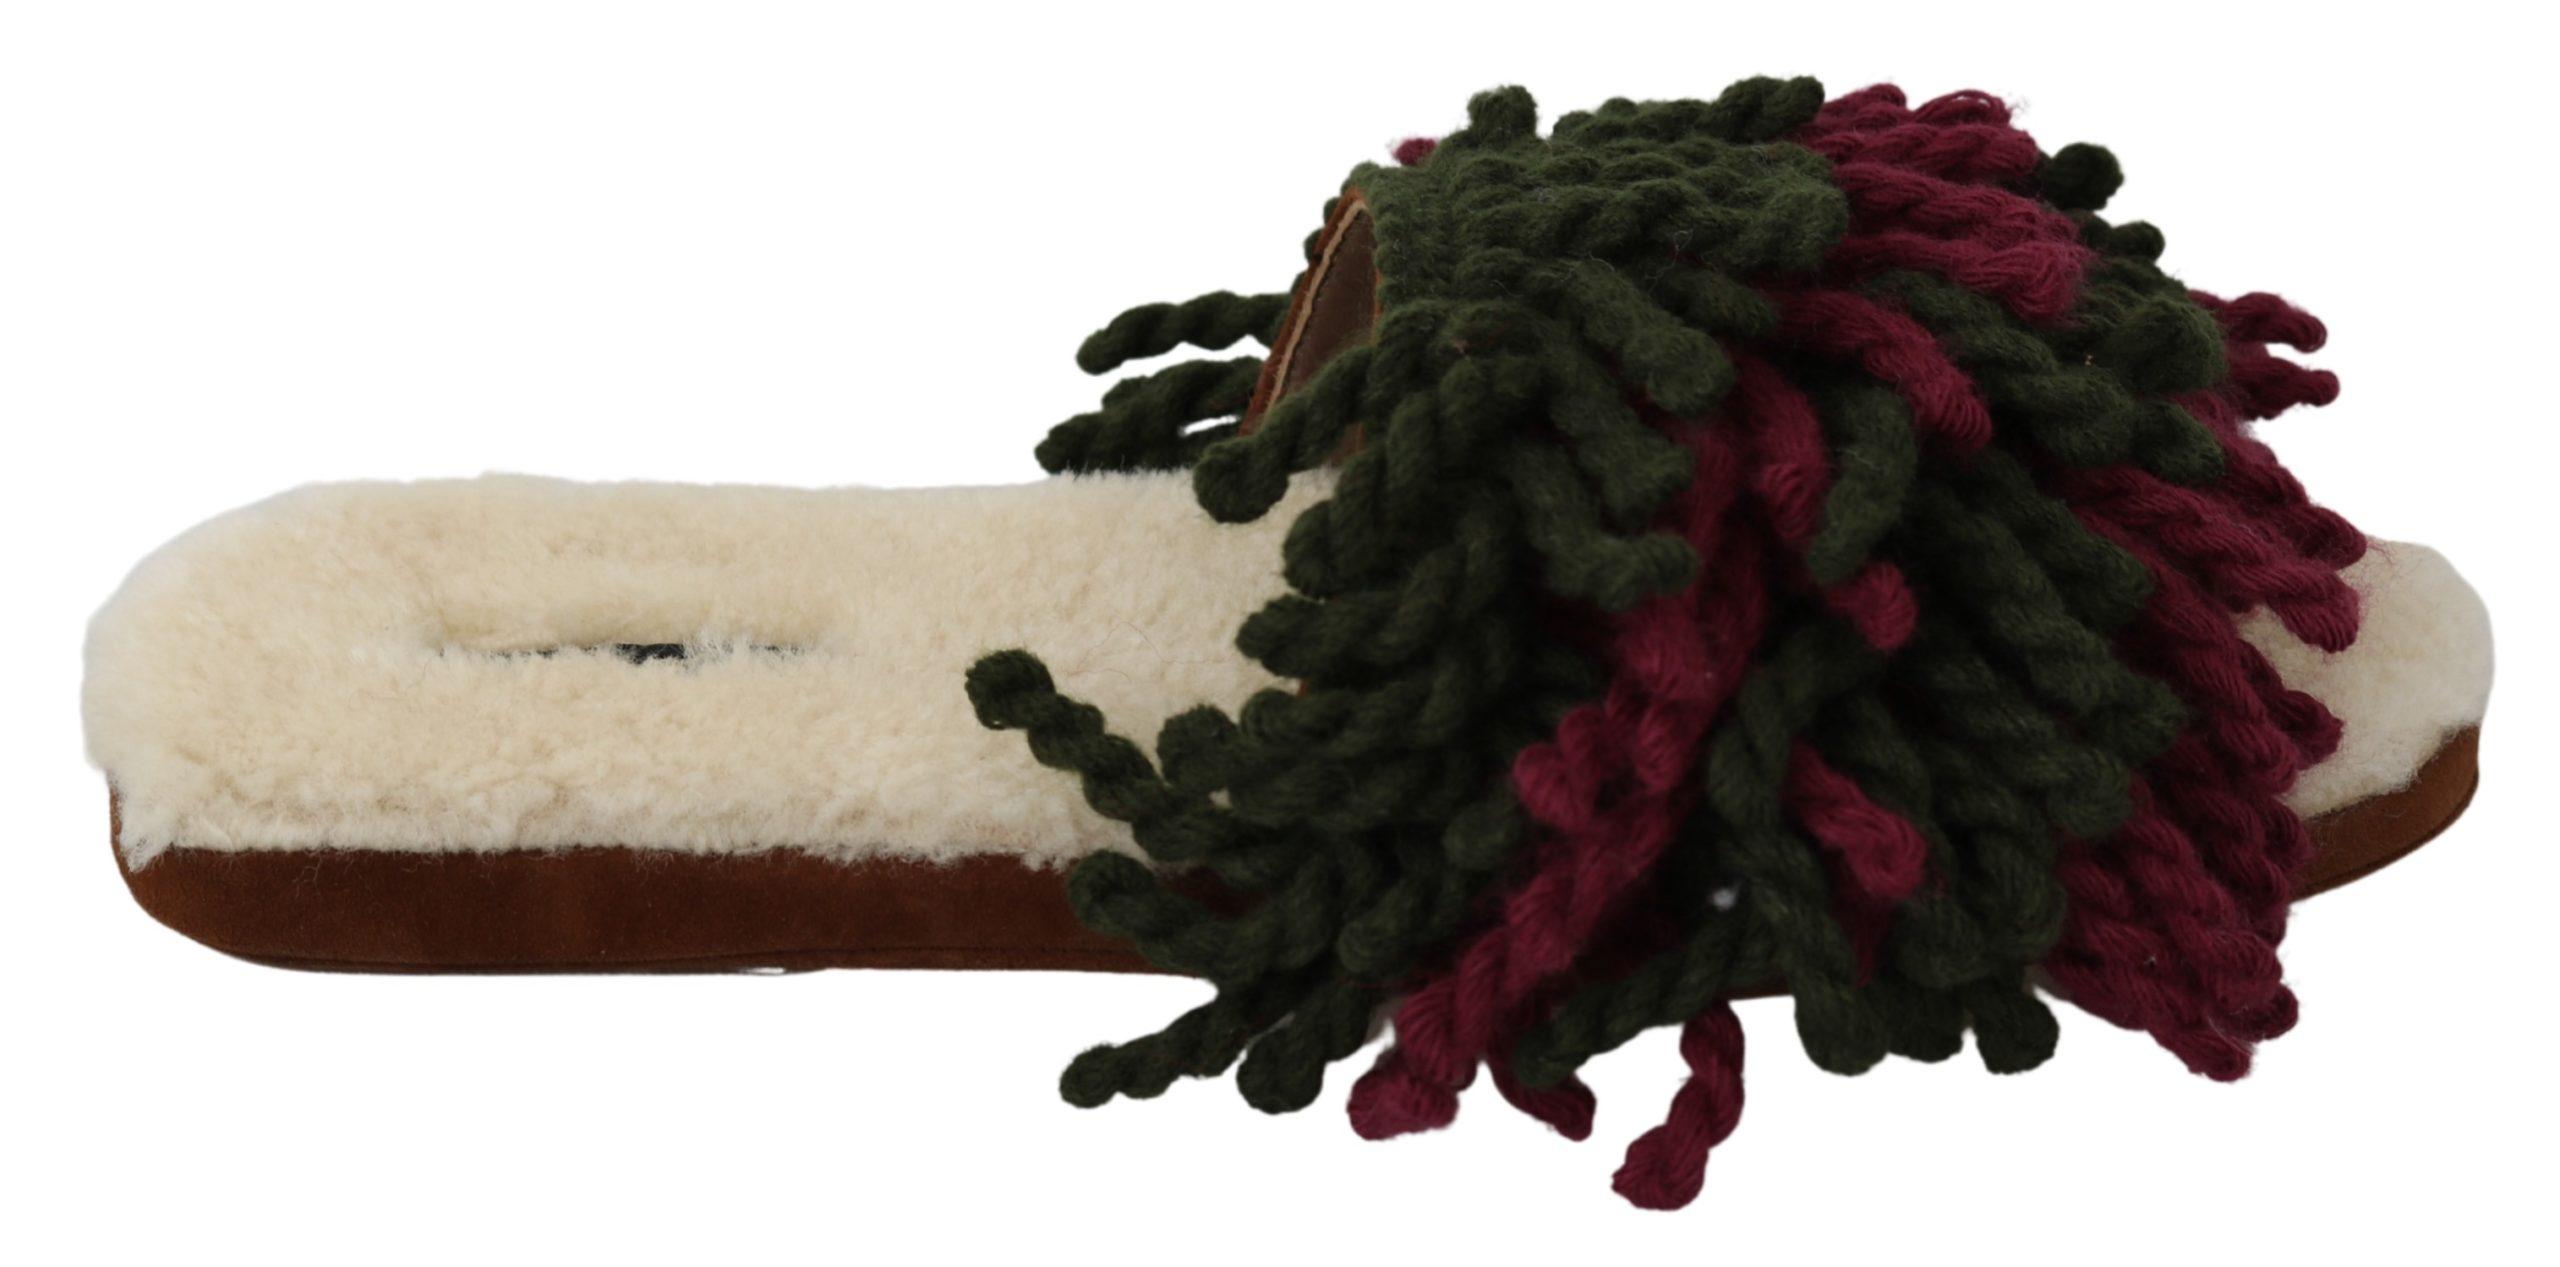 Dolce & Gabbana Women's Suede Shearling Slippers Multicolor LA6893 - EU39/US8.5